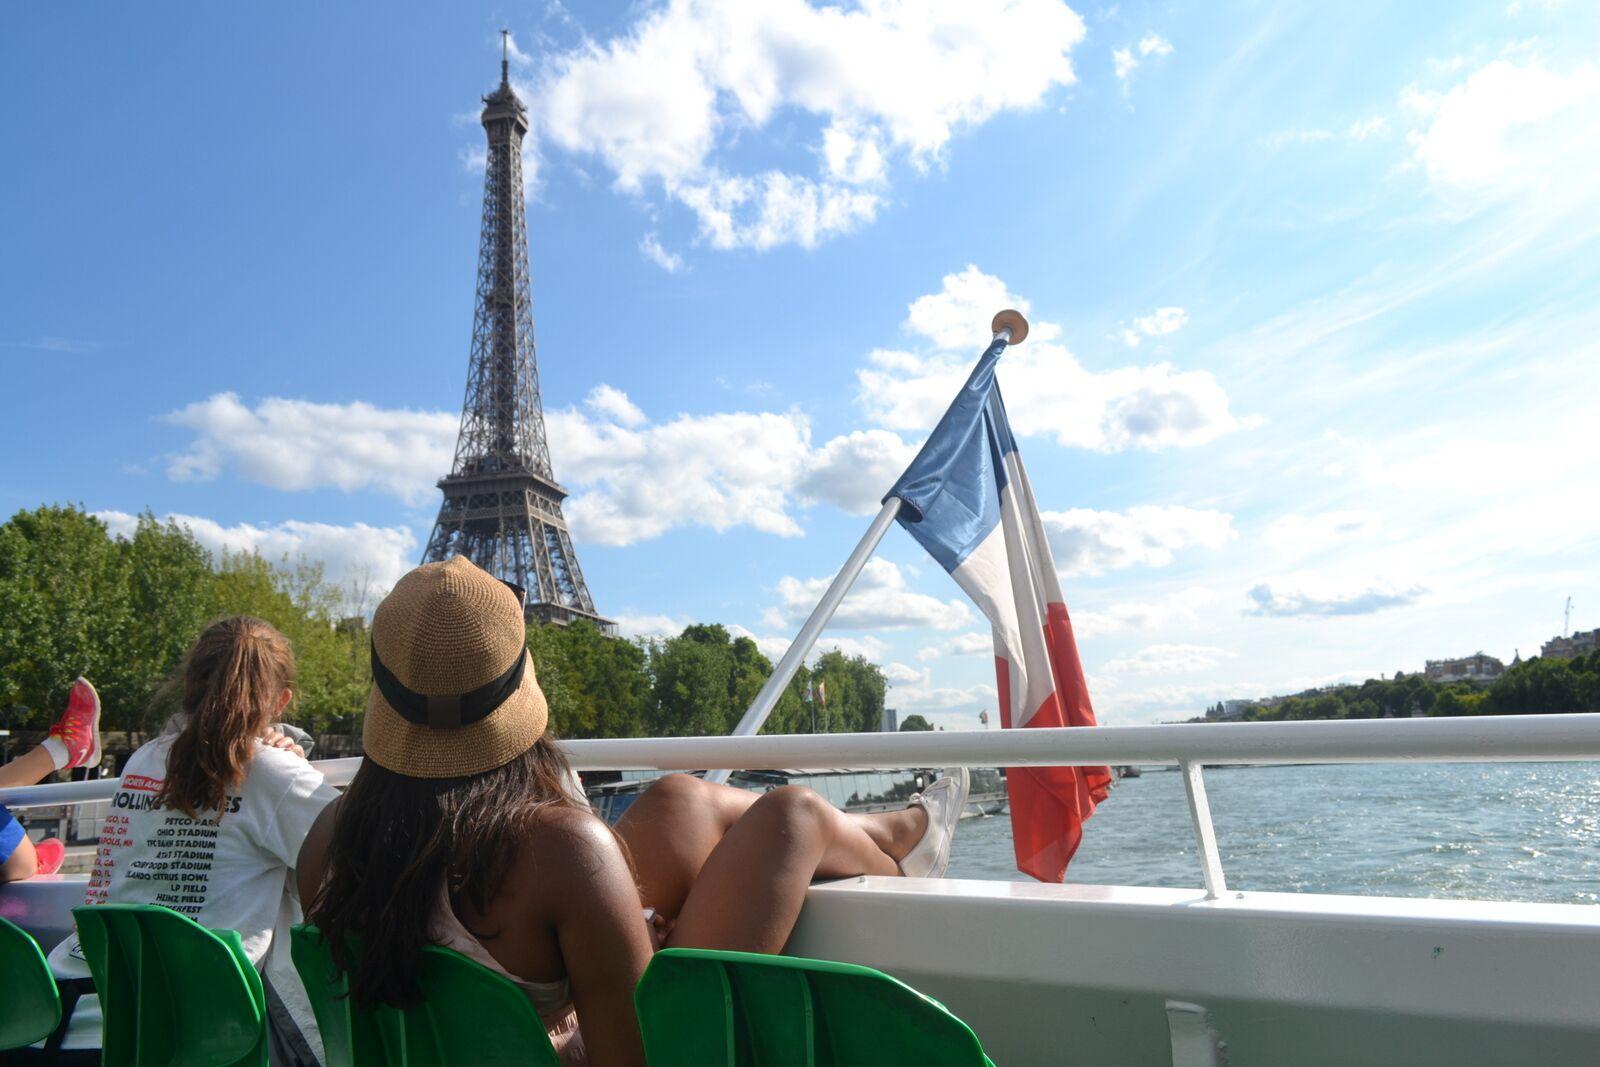 Summer Program - Adventure/Trips   Travel For Teens: Berlin, Paris, and London